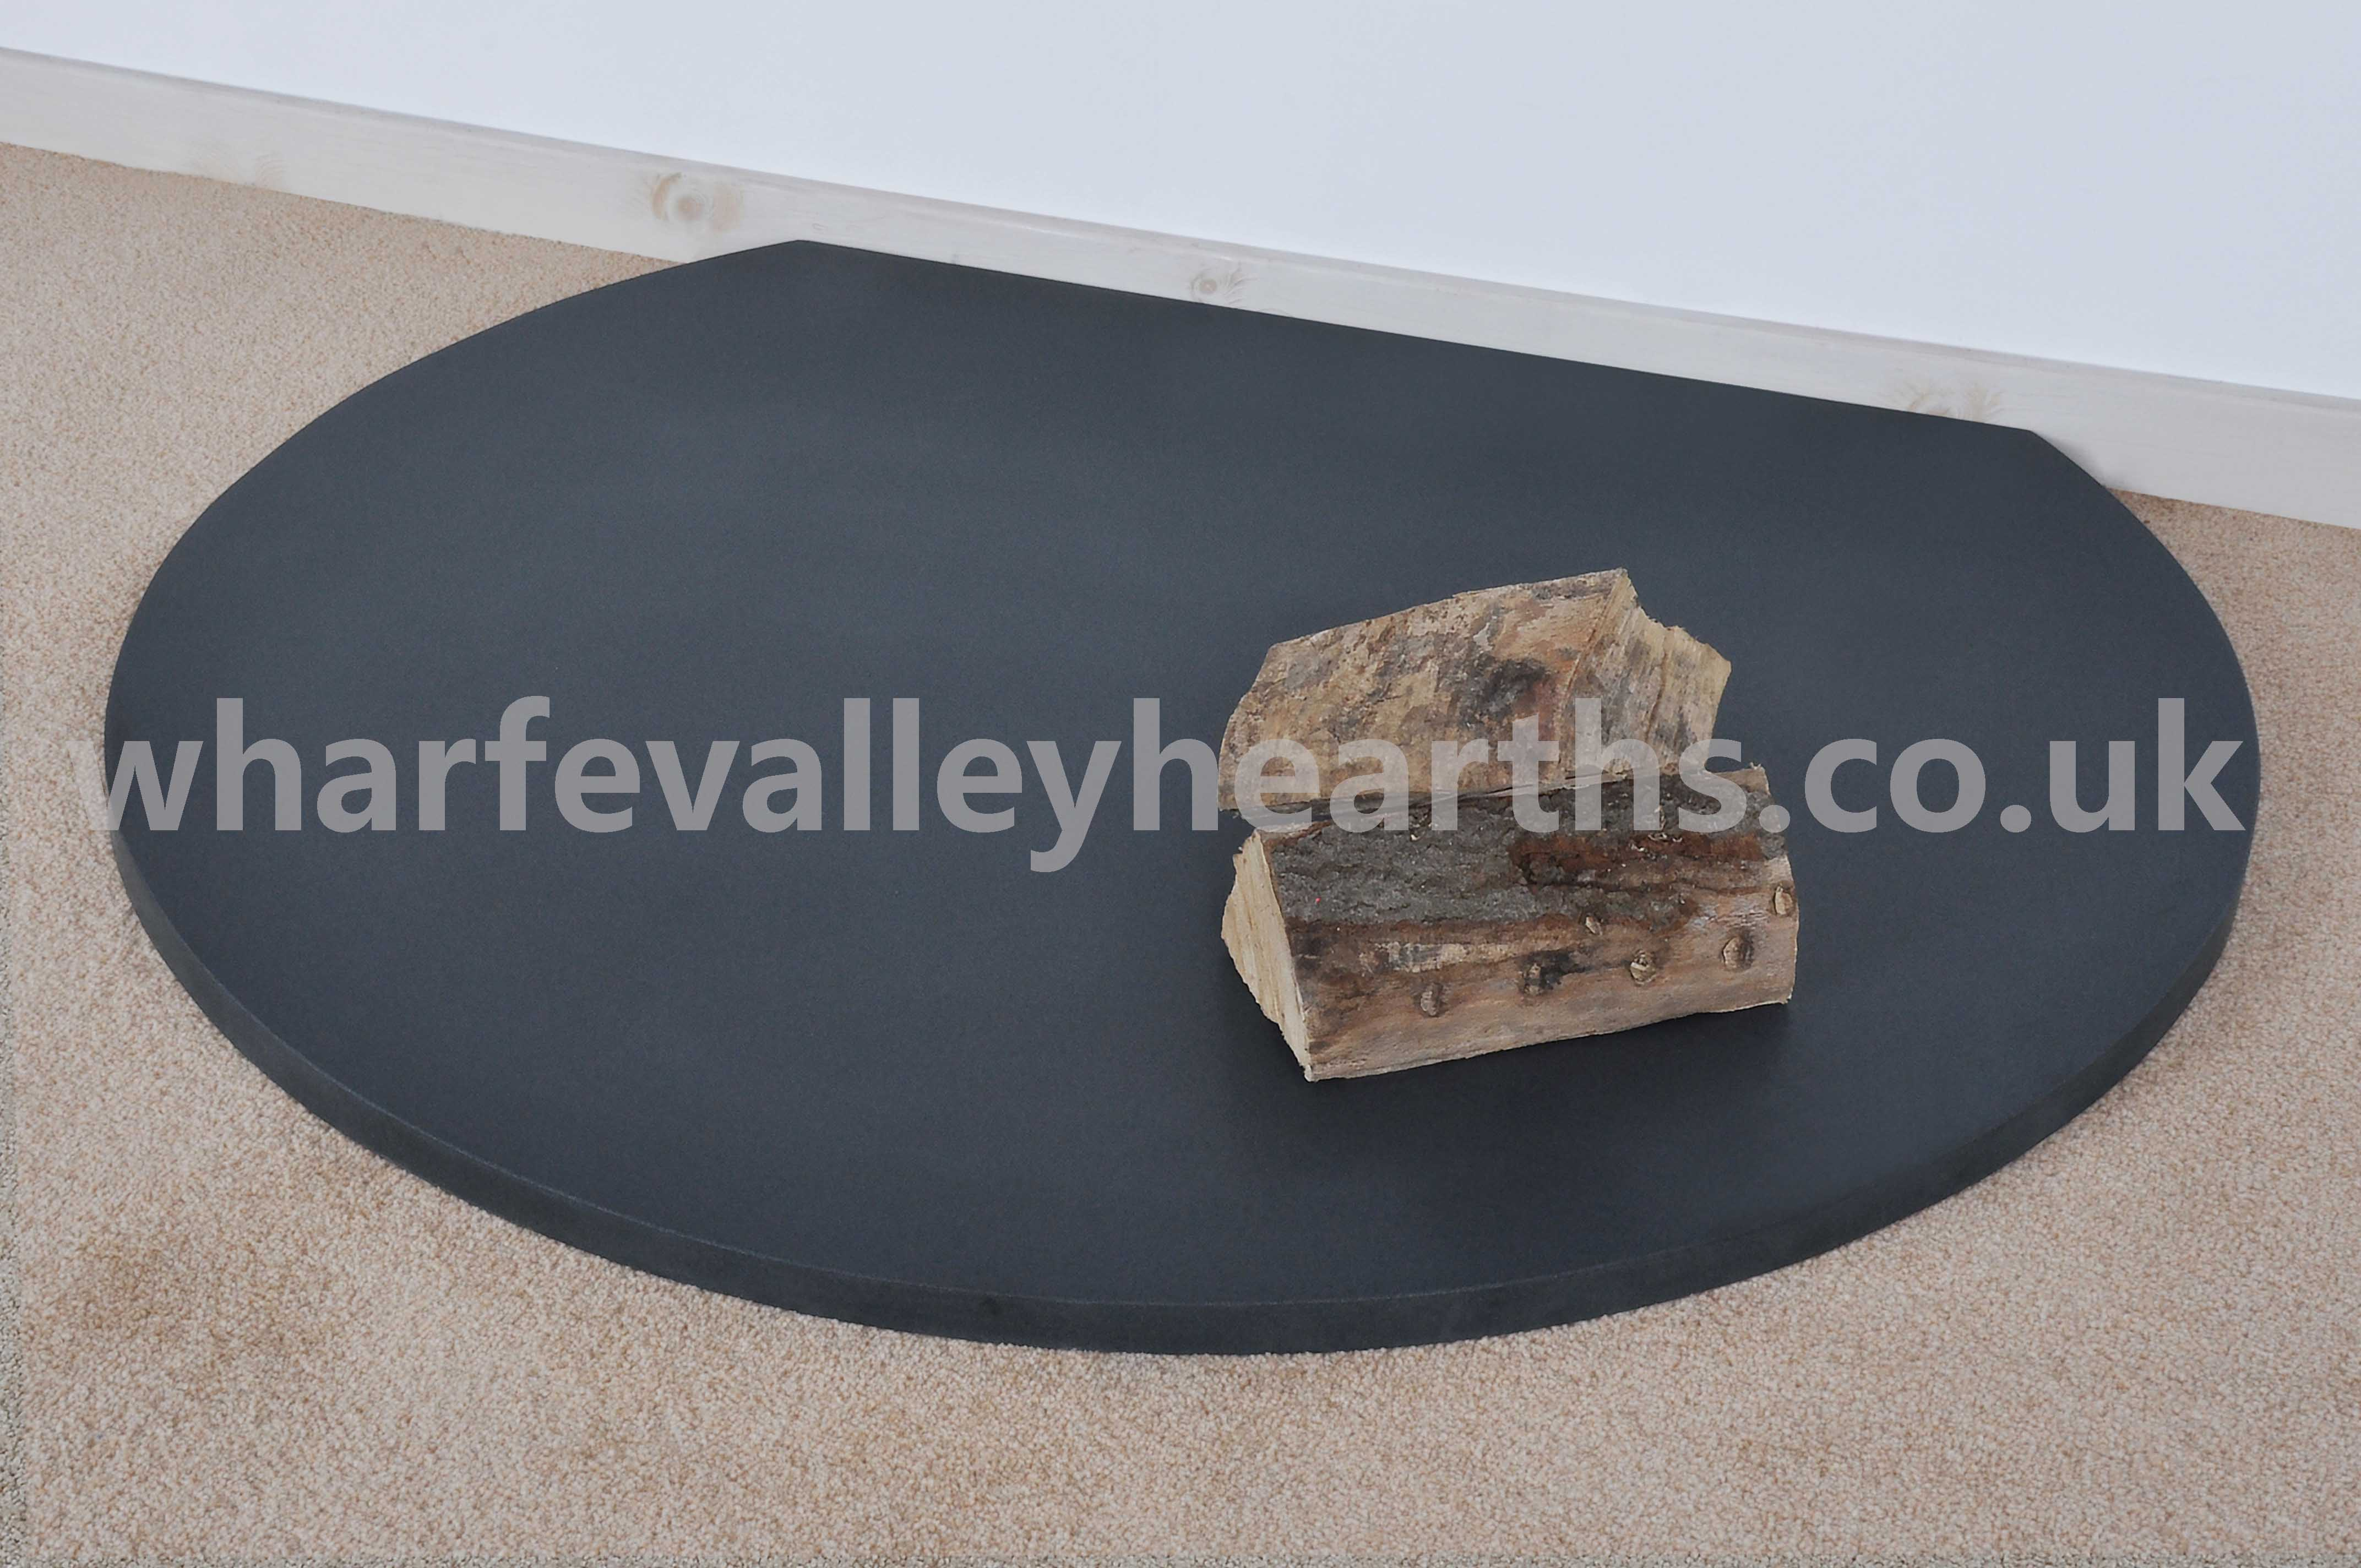 Truncated Honed Granite Hearth Wharfe Valley Hearths